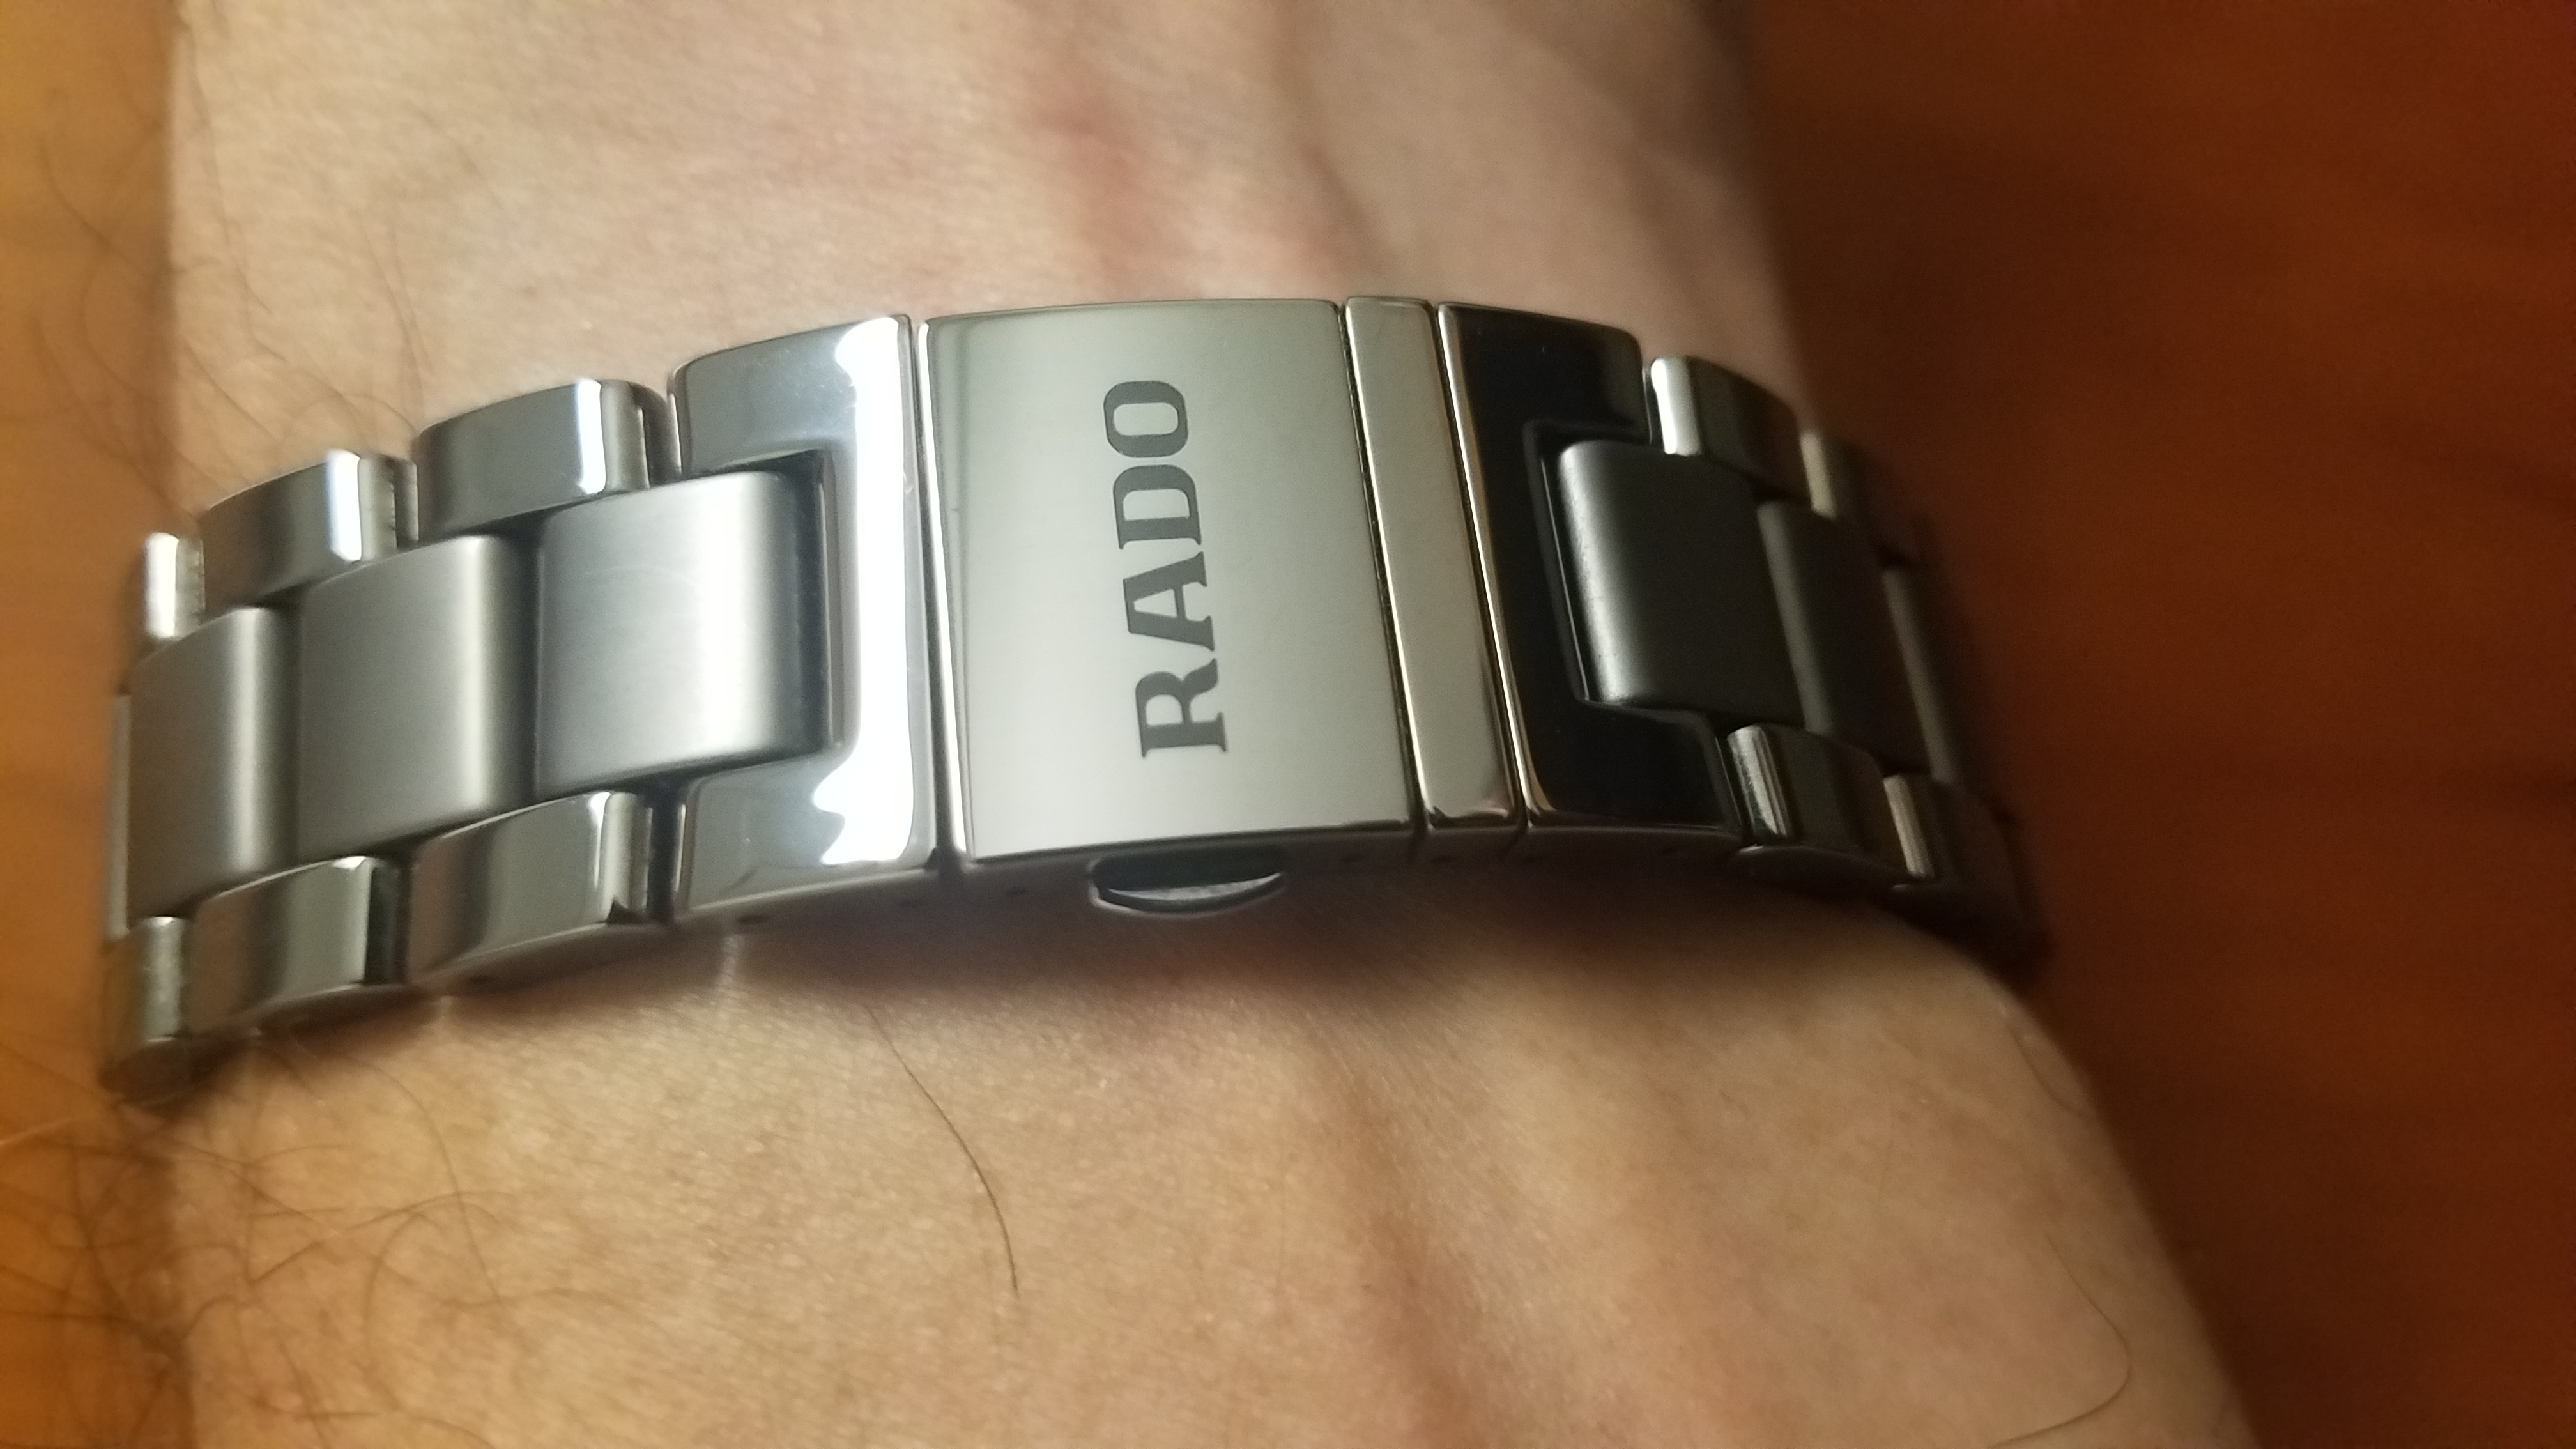 Click image for larger version.  Name:Rado_3.jpg Views:384 Size:1.99 MB ID:12672935